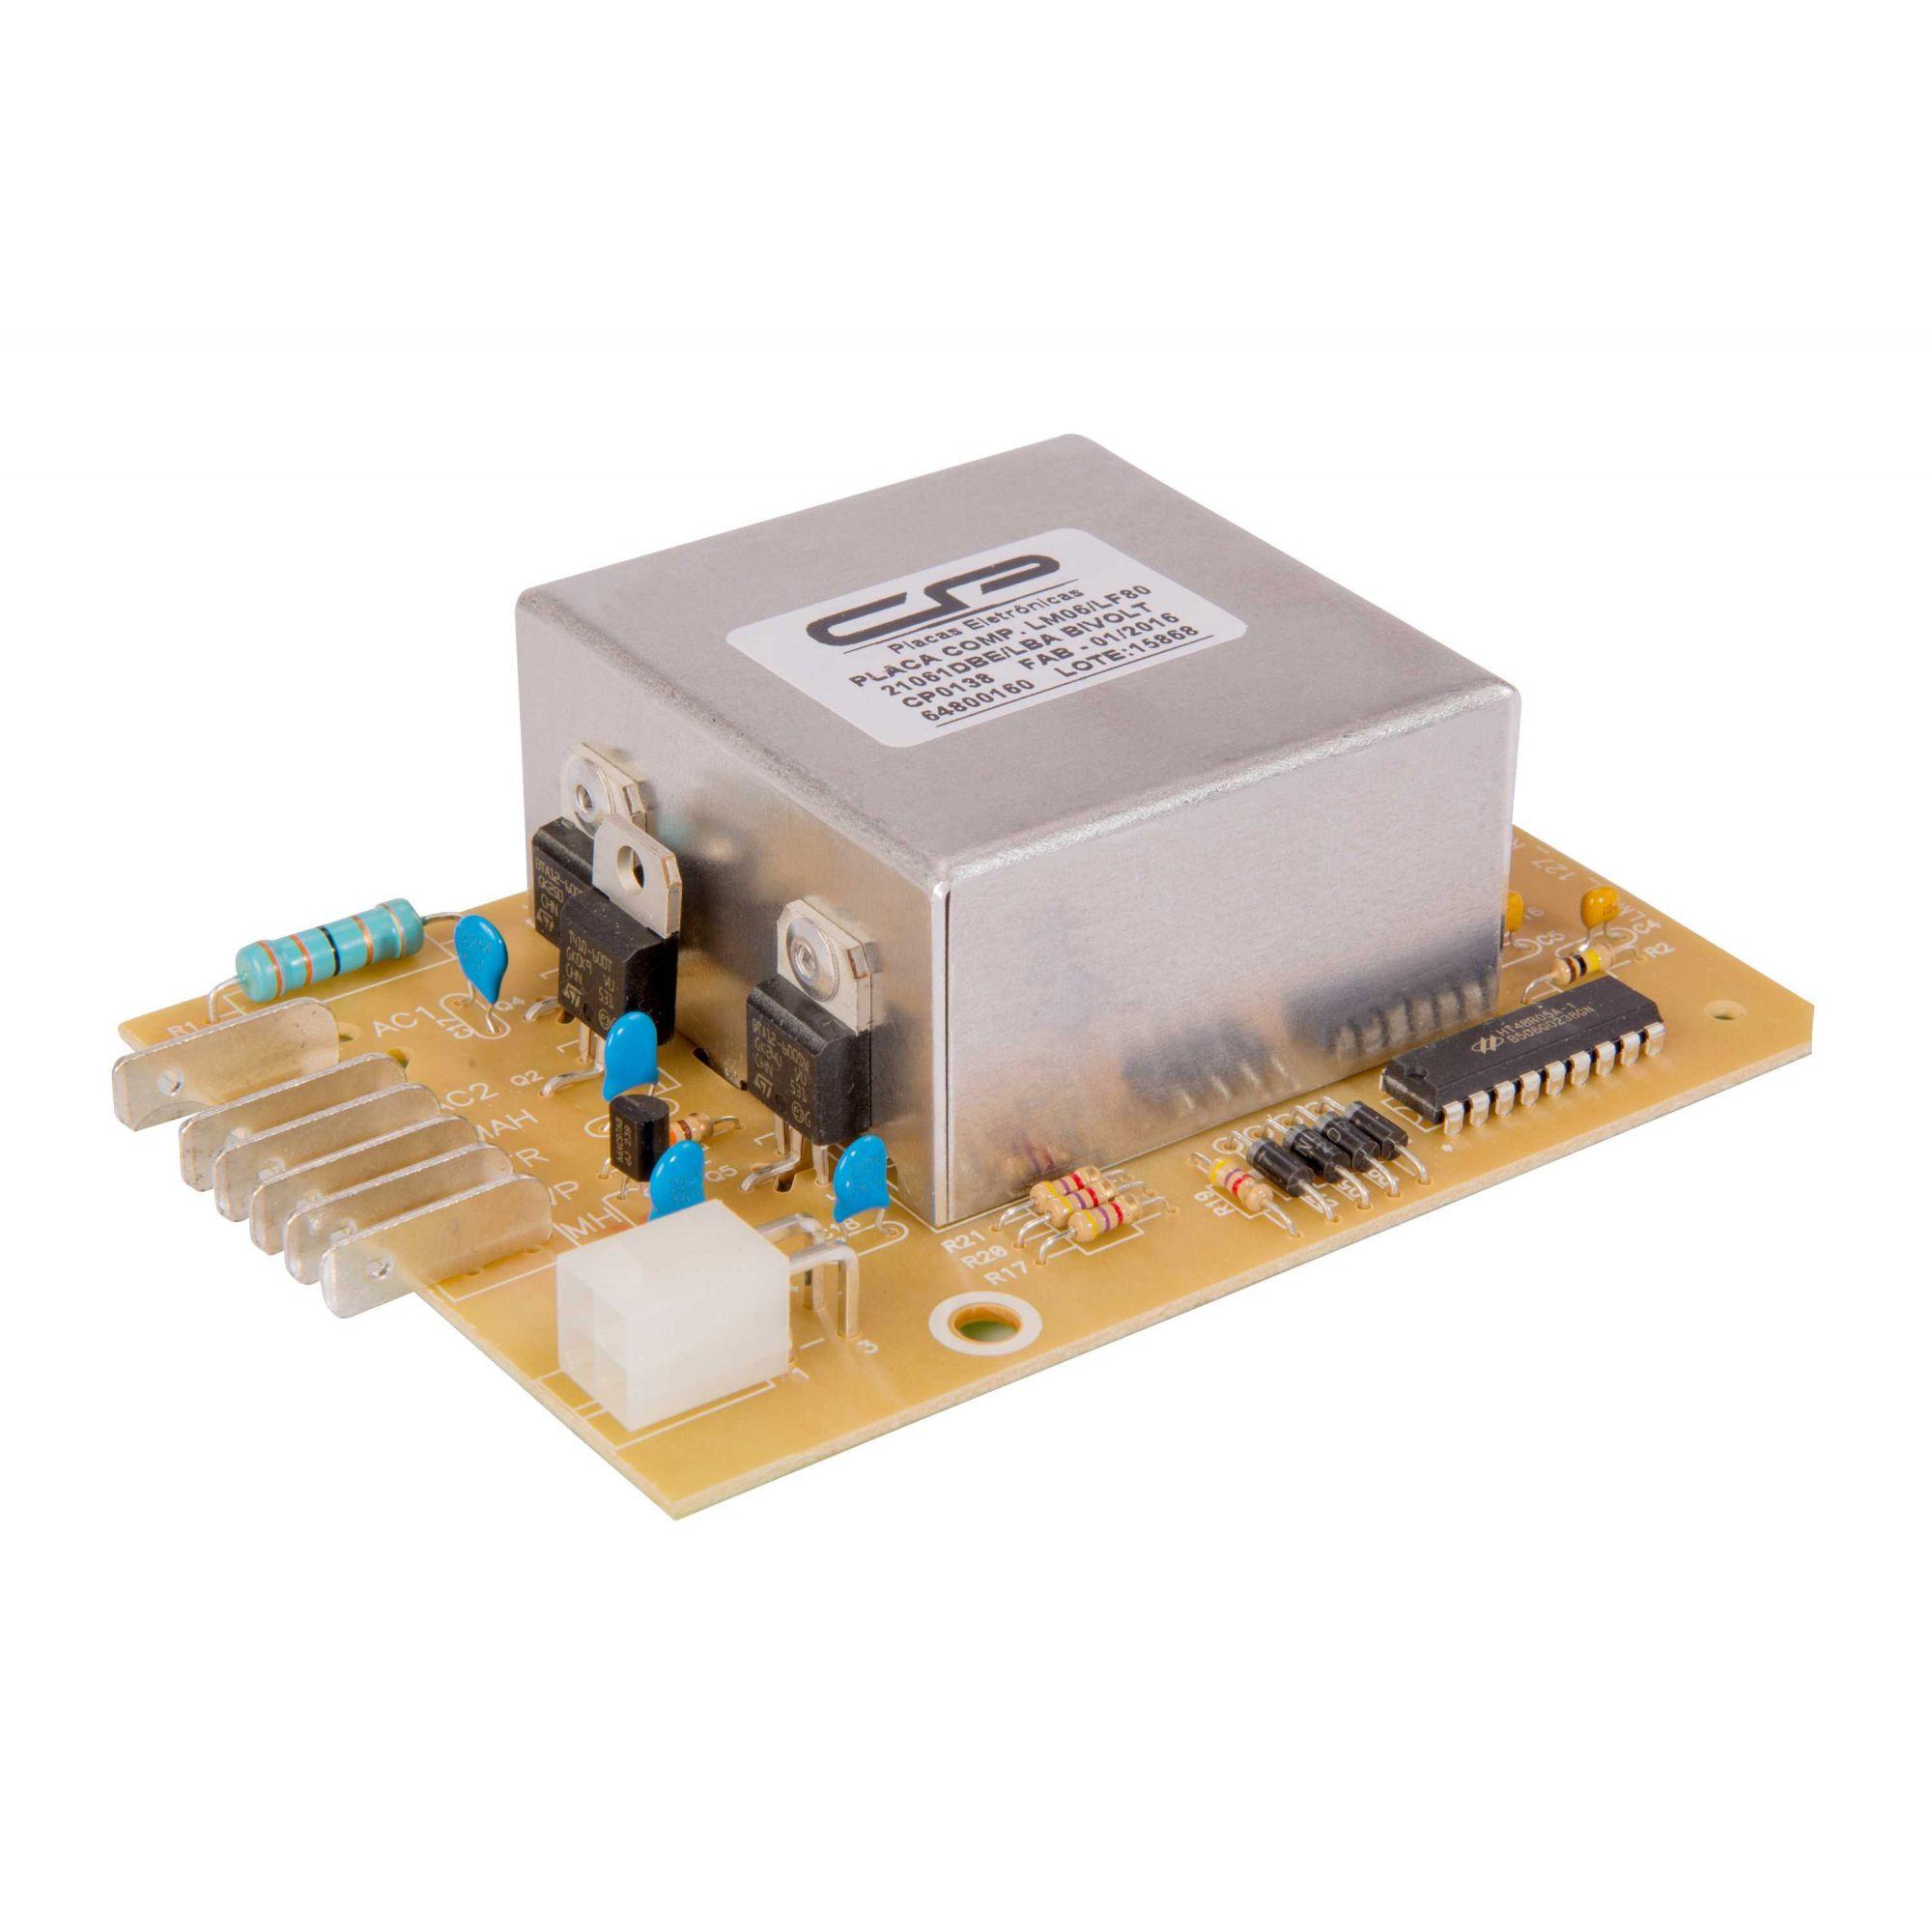 PLACA ELETRONICA LAVADORA ELECTROLUX LM06 LF80 CP0138